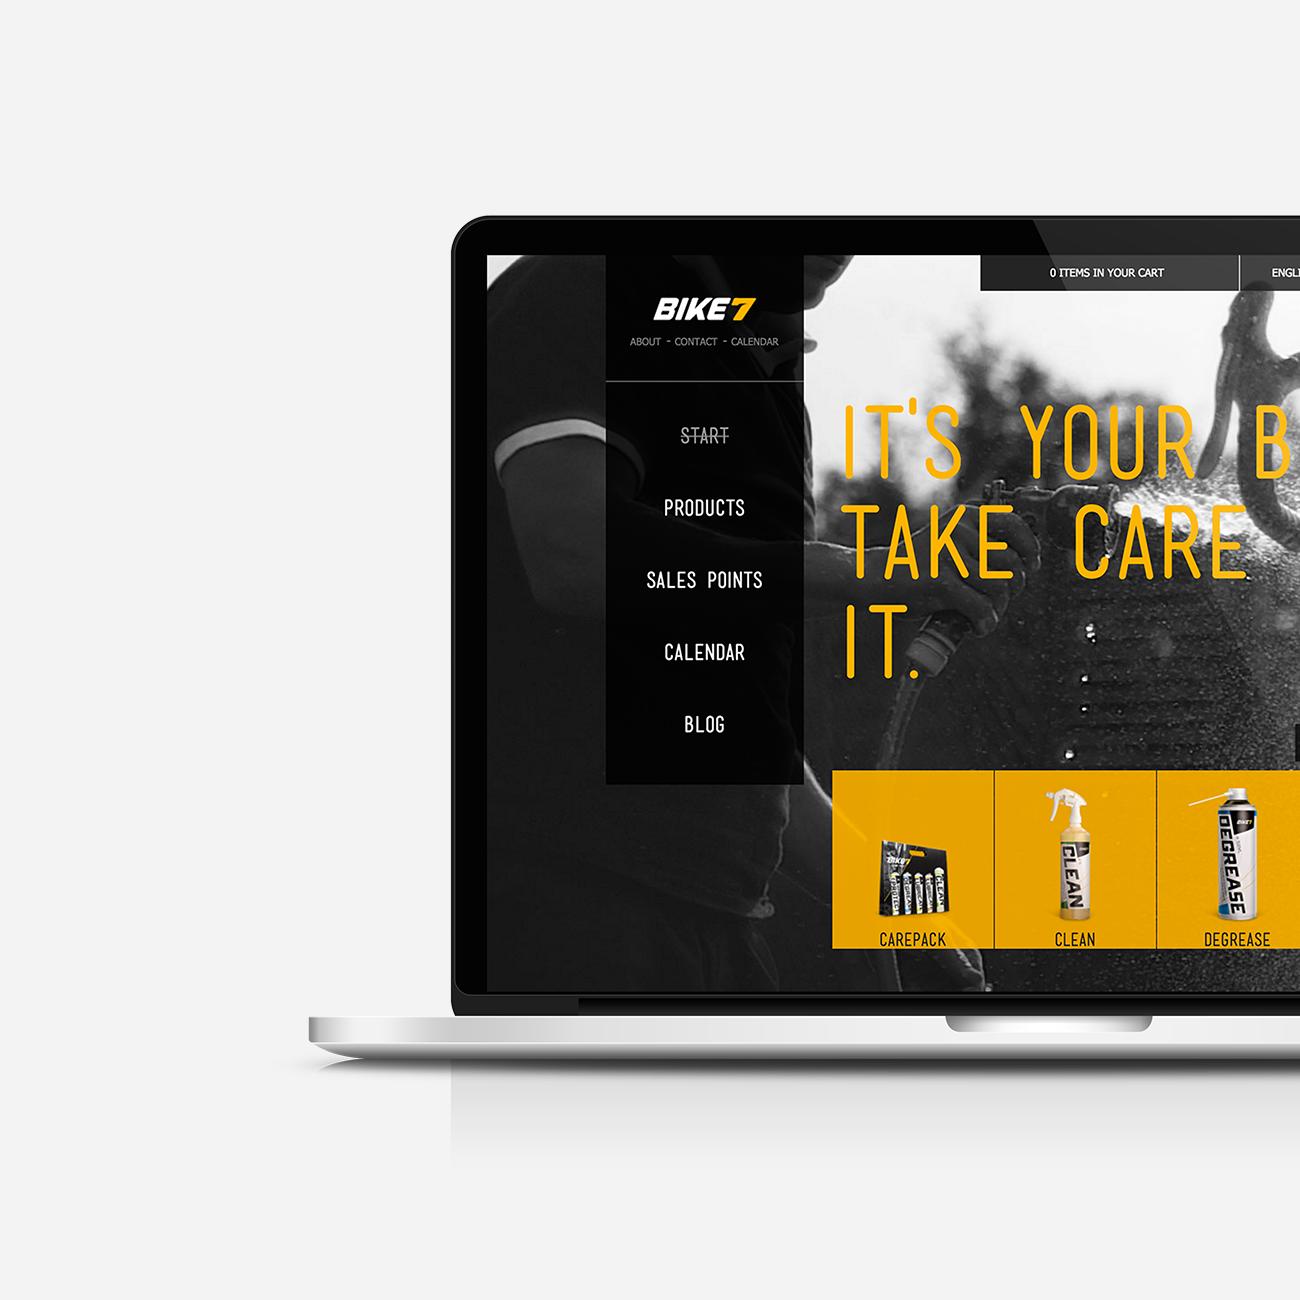 Bike7 - Website